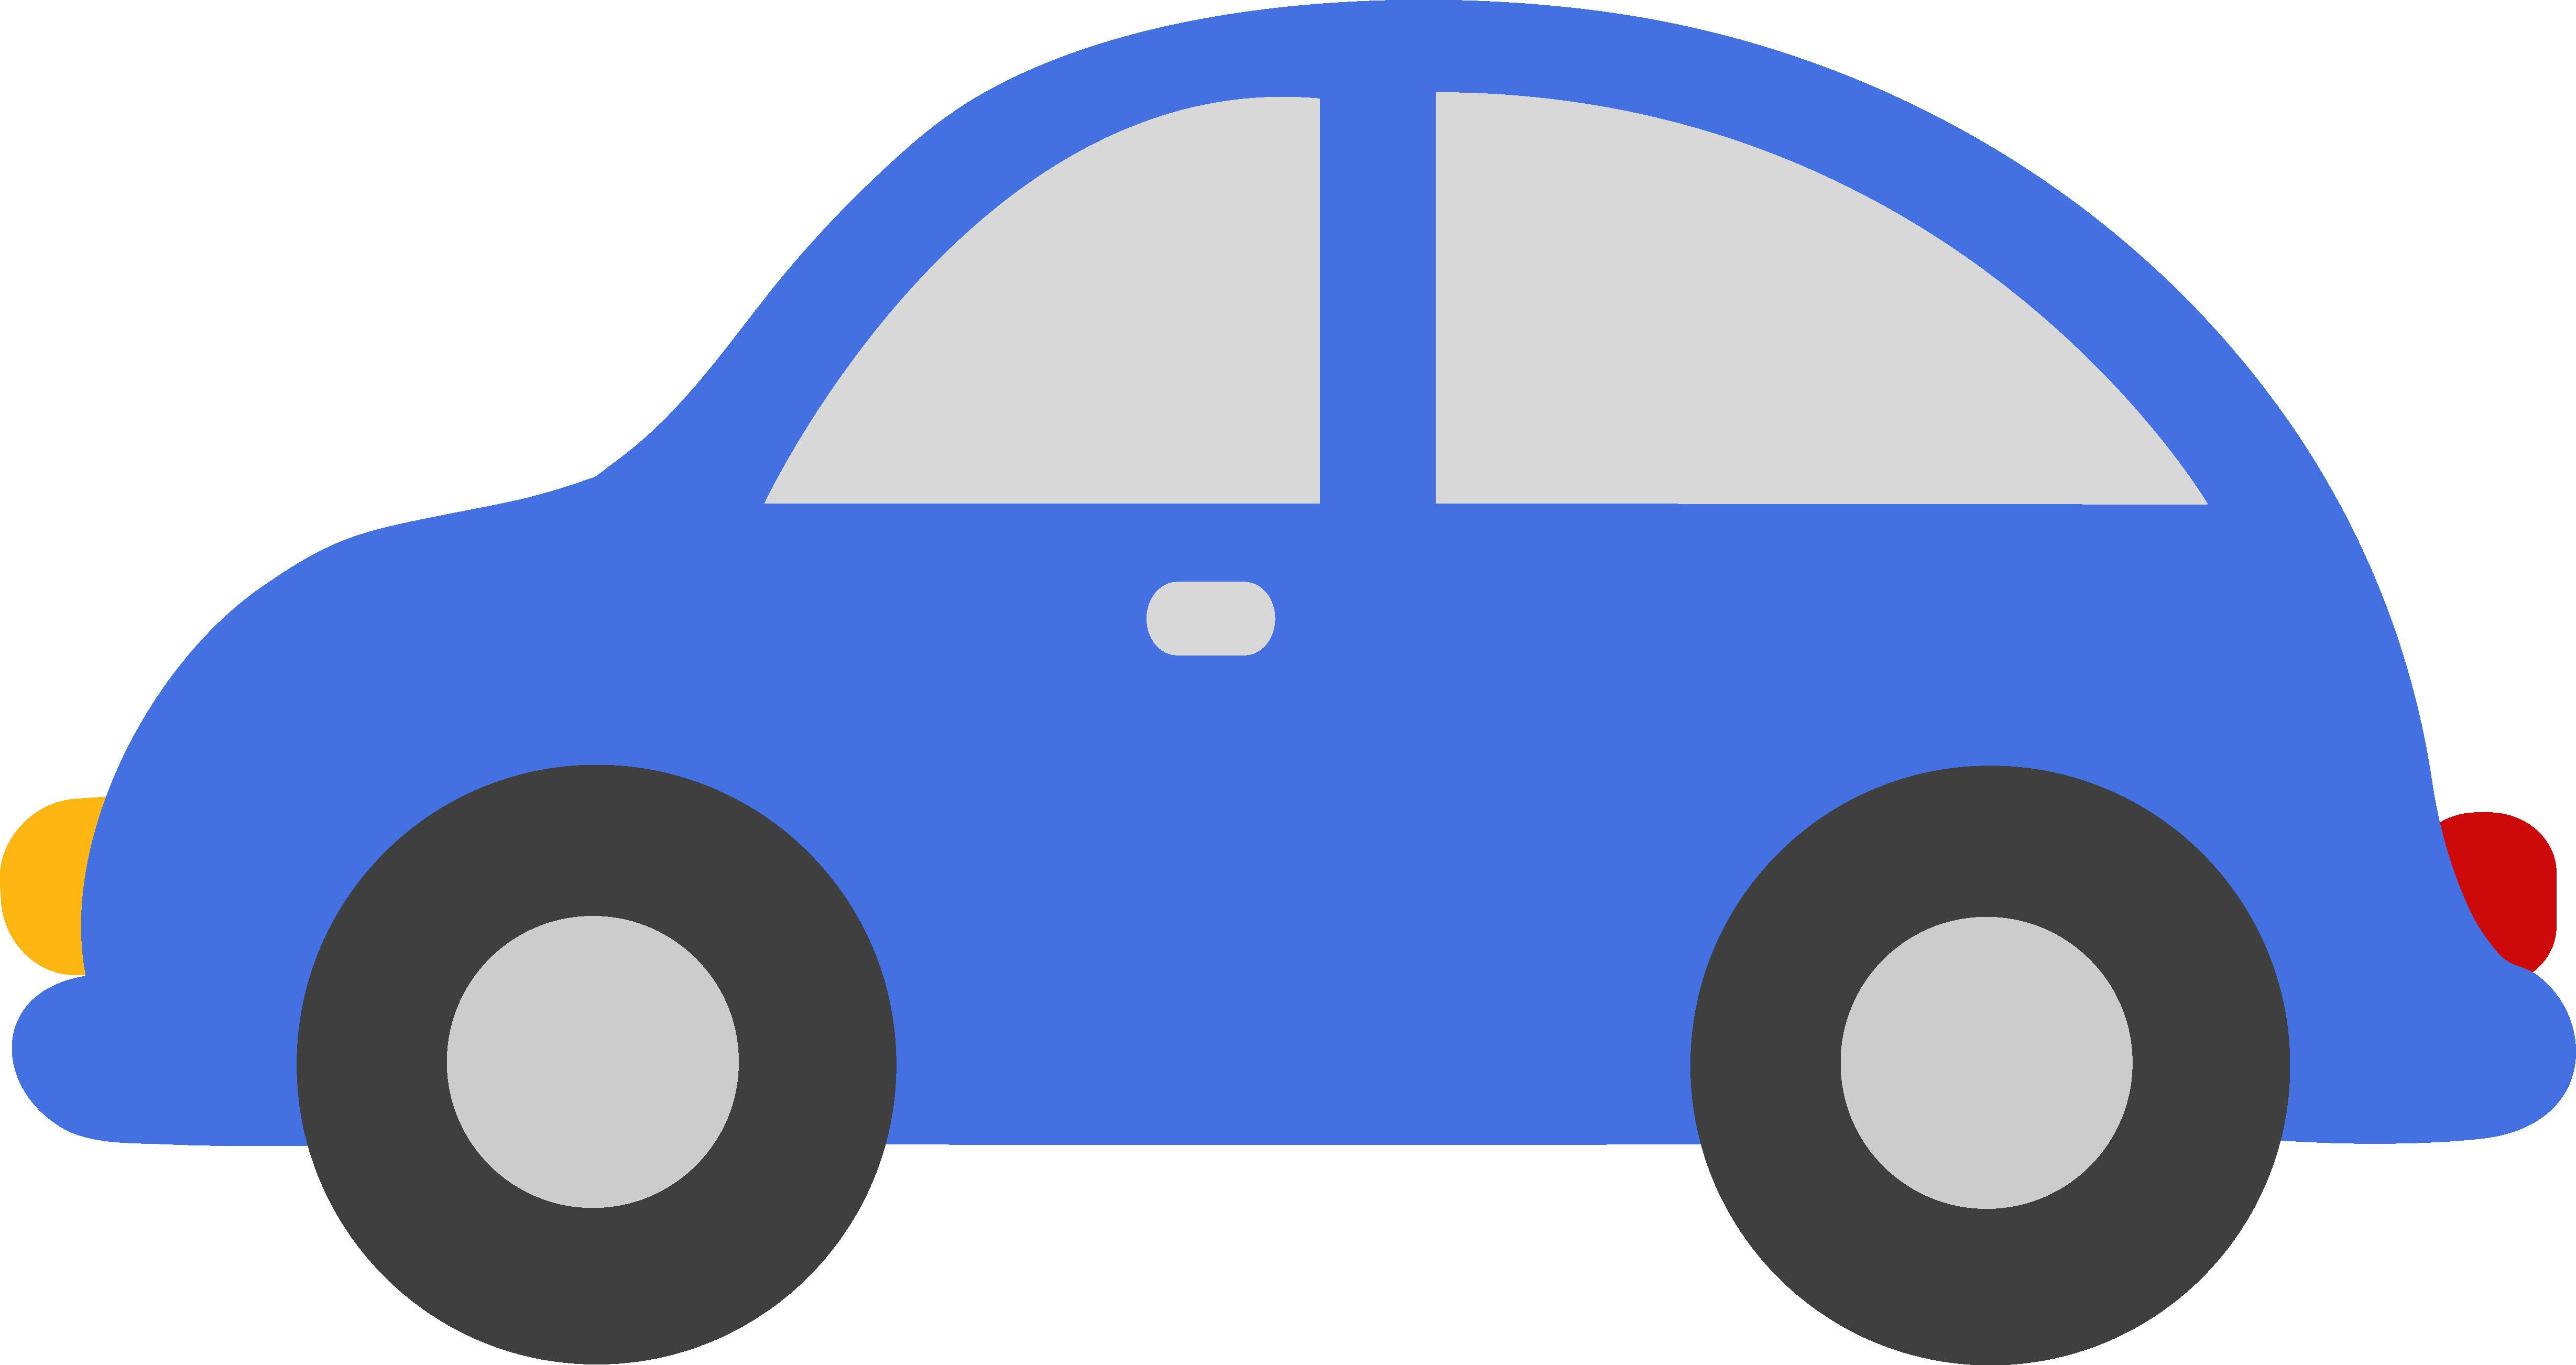 Car clipart #16, Download drawings